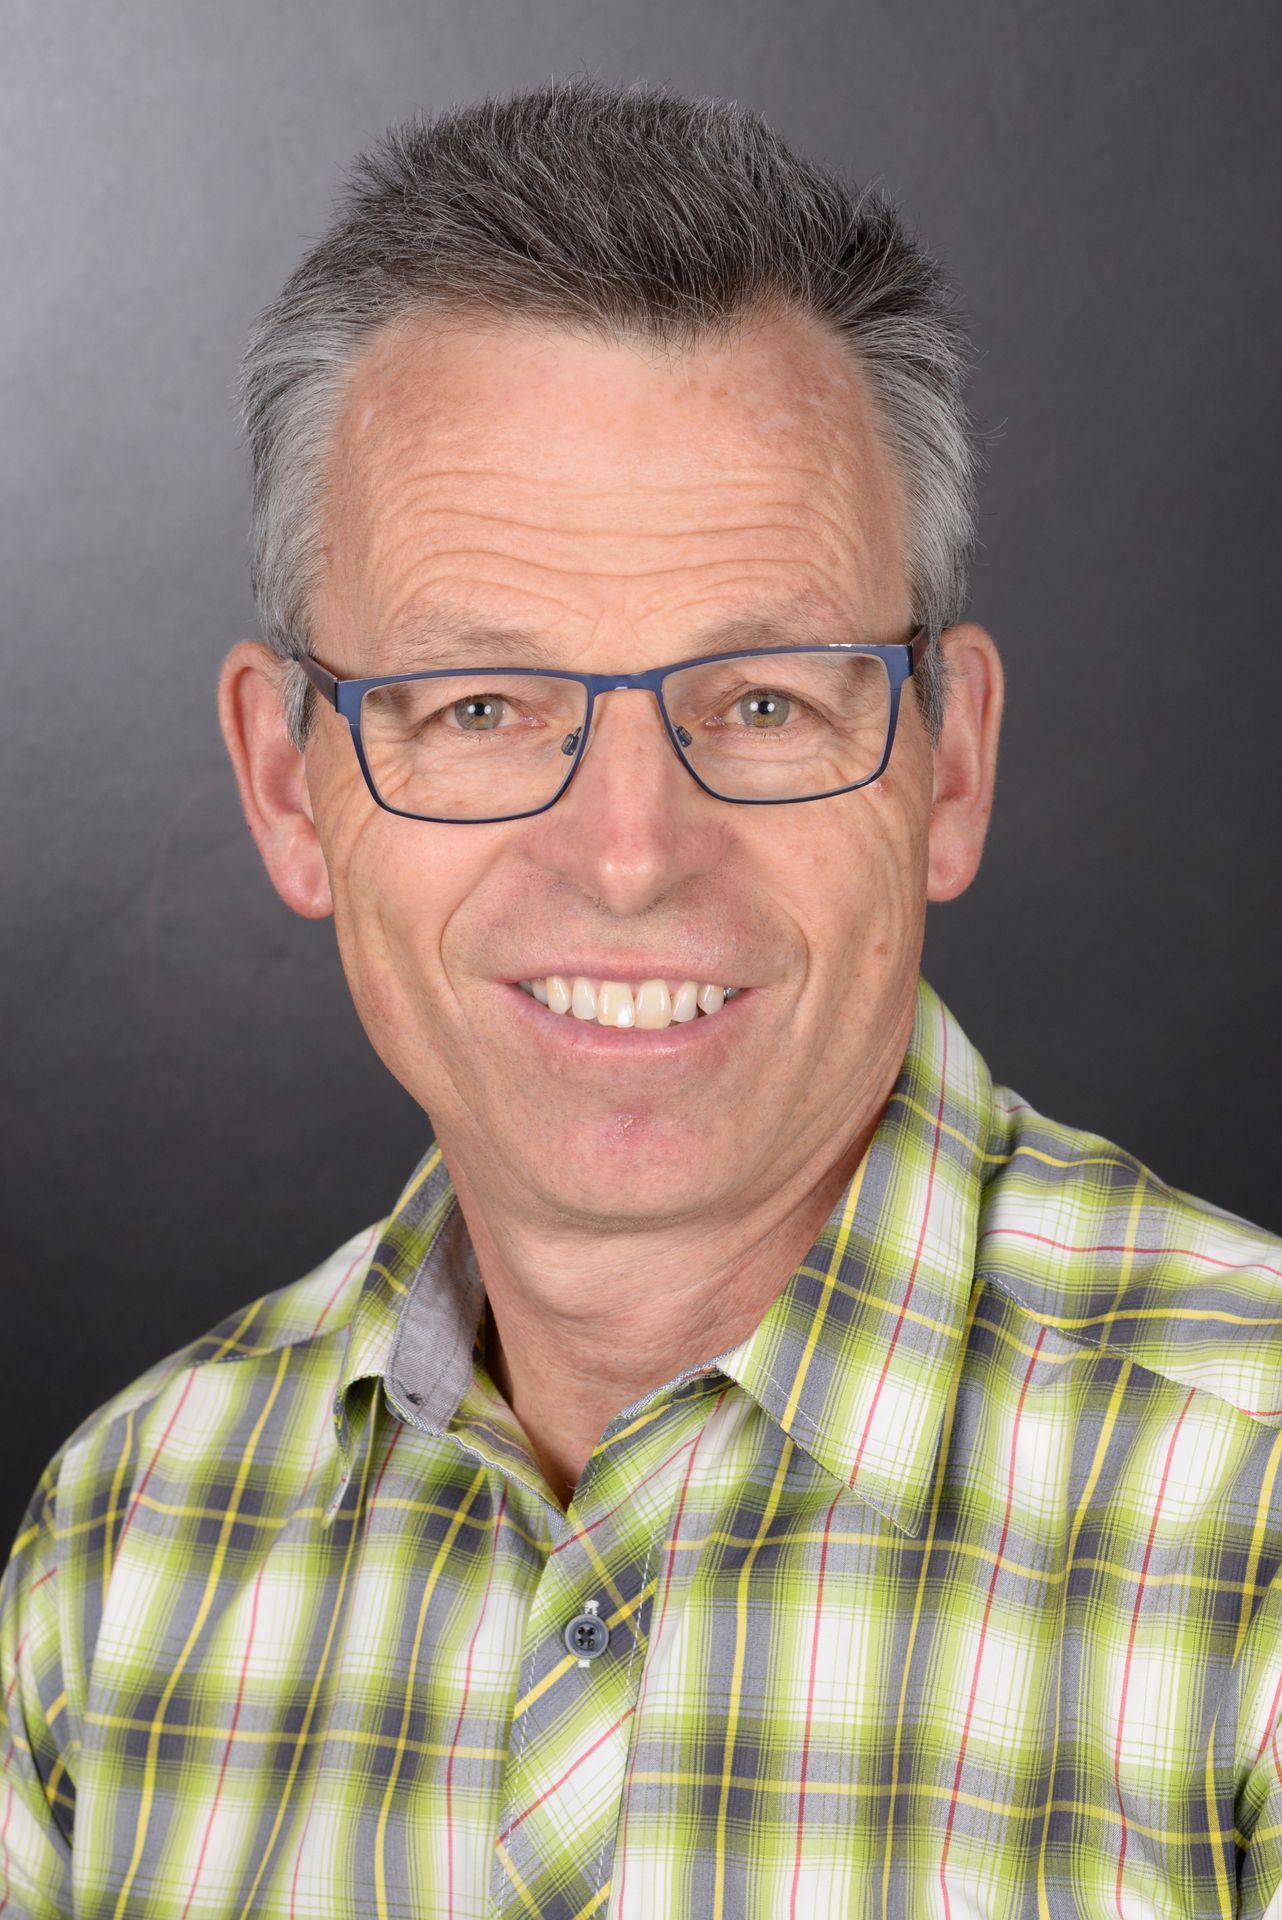 Martin Ulrich-Ruoss